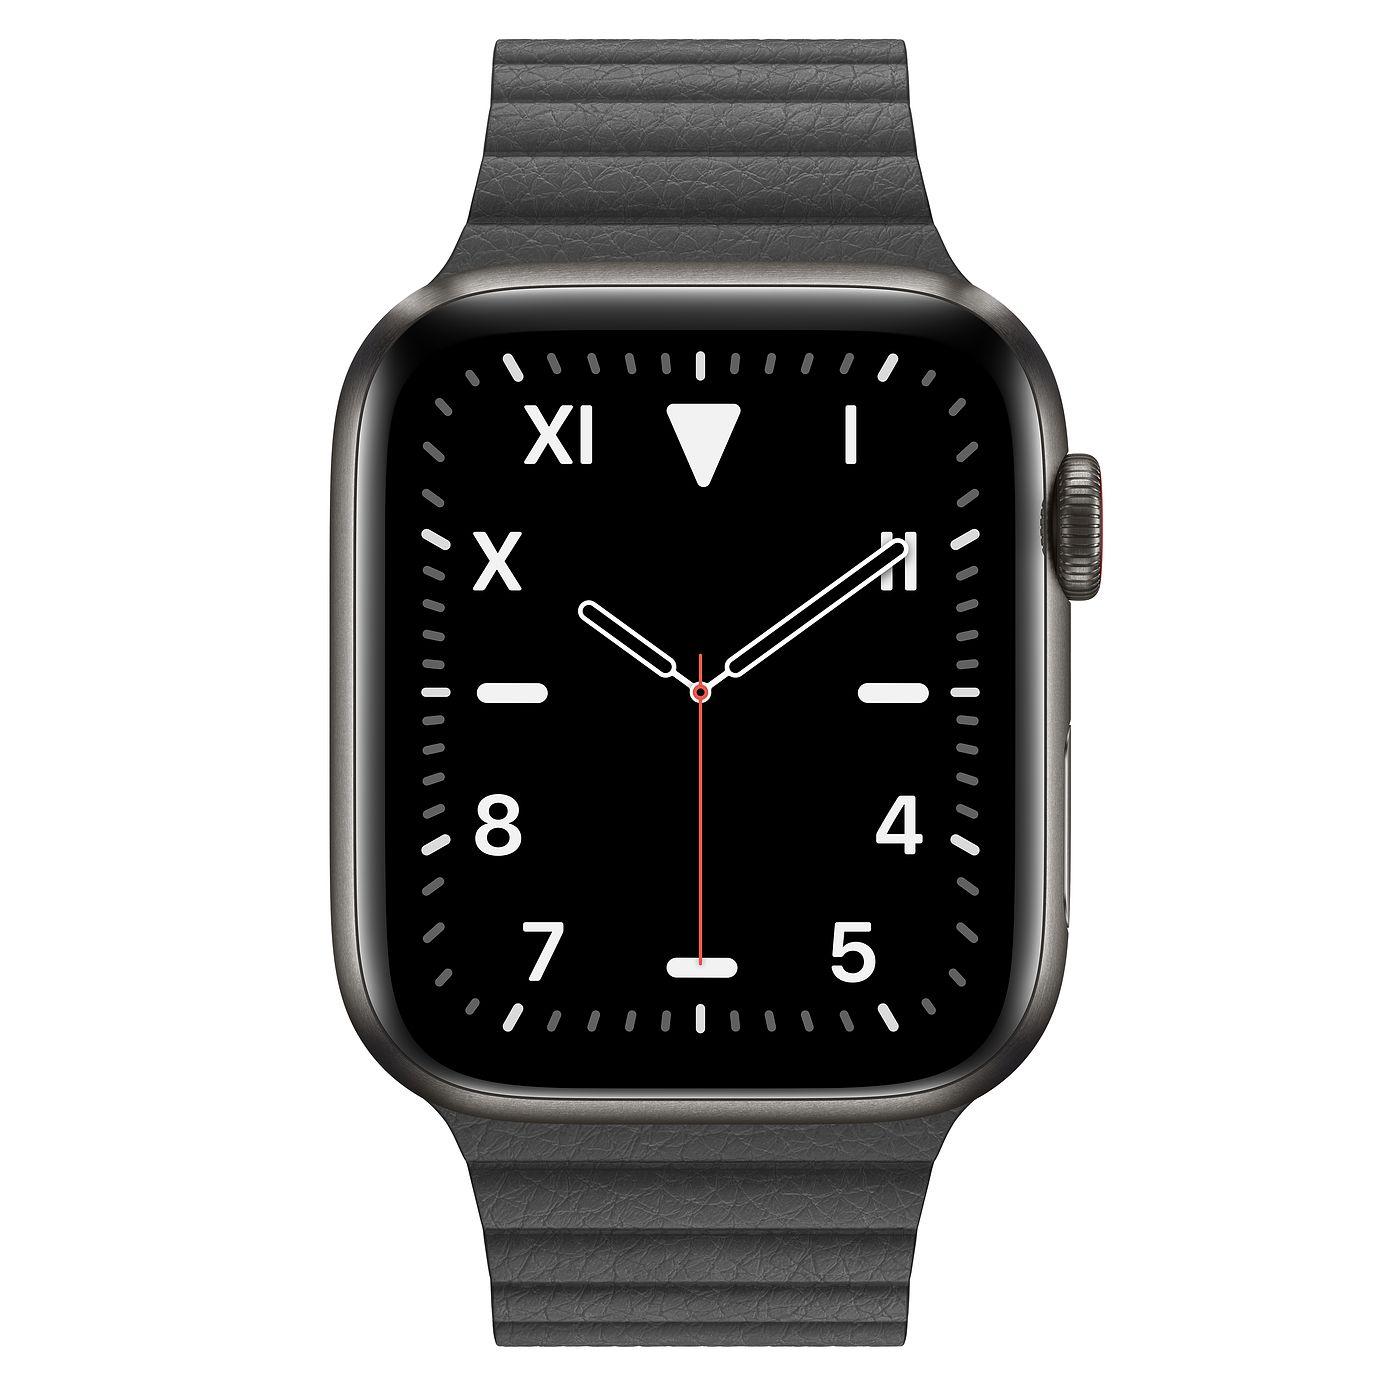 Apple Watch Series 5 (Titanium Black,GPS)